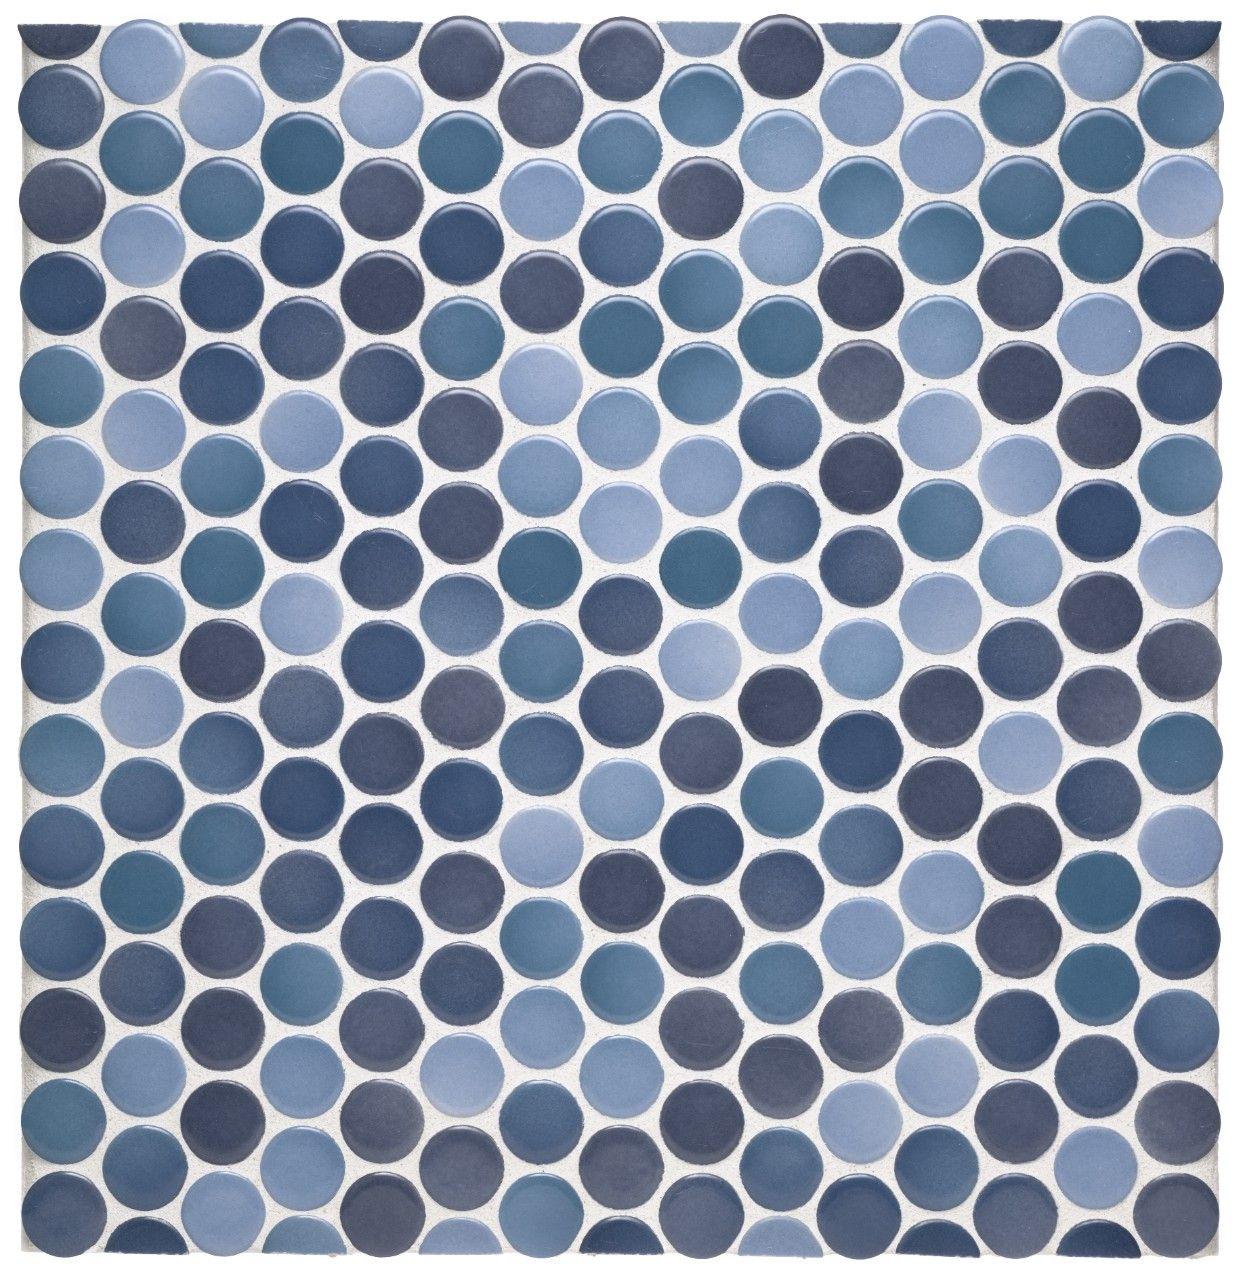 Circle Tiles Penny Tile Kitchen Collections Waterworks Backsplash Tile